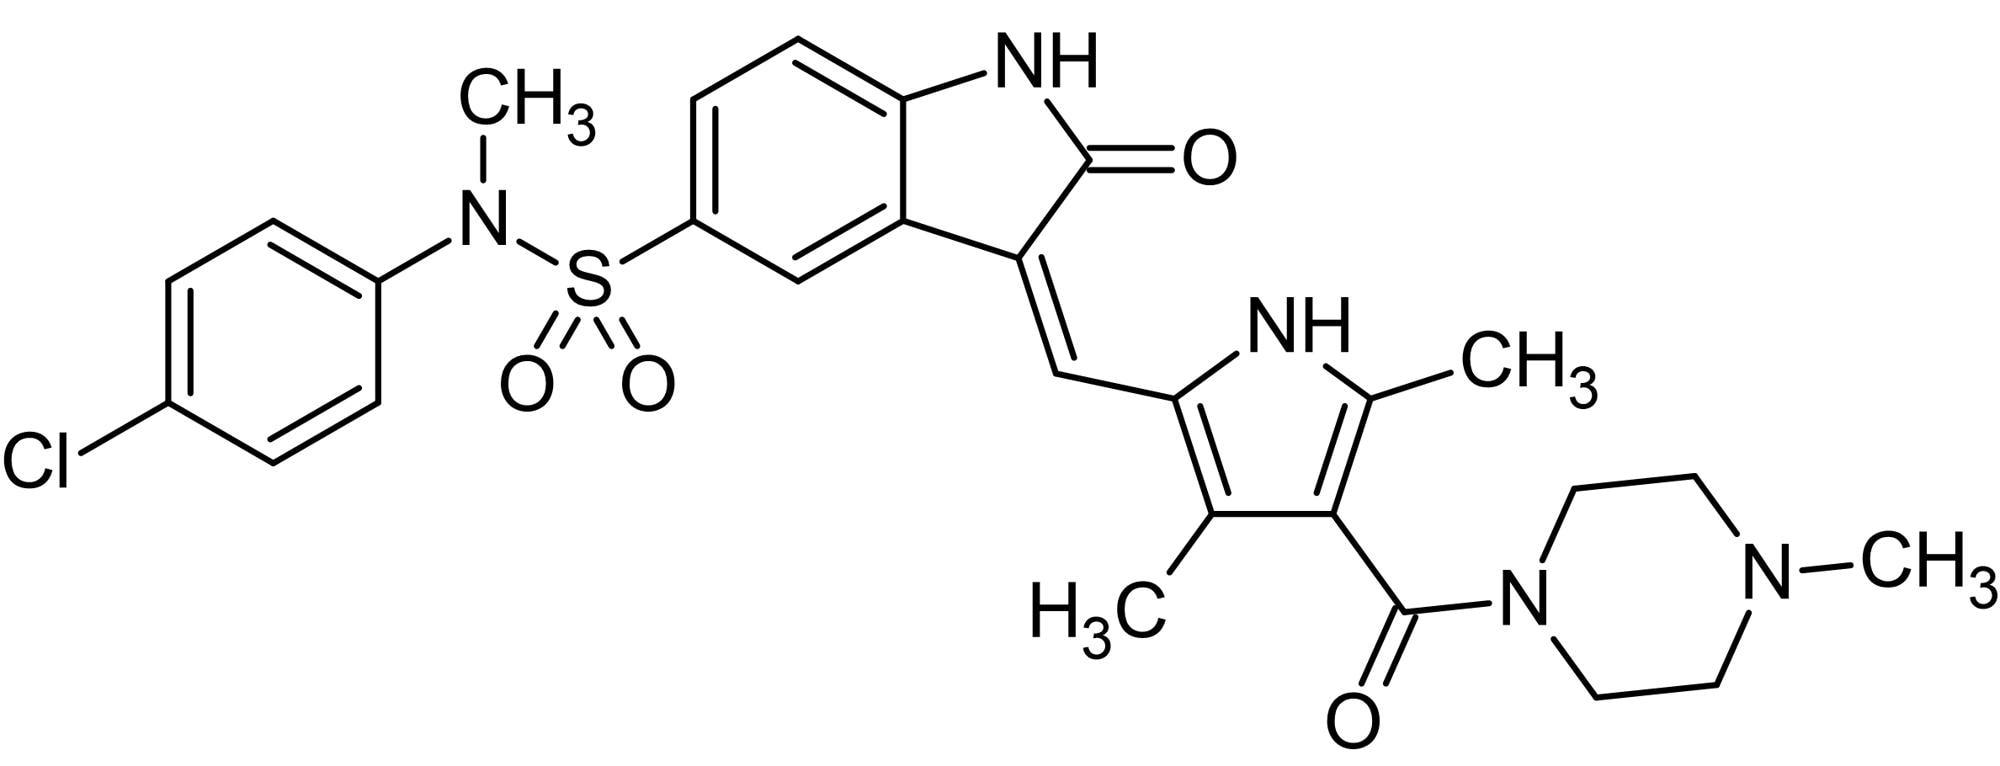 Chemical Structure - SU 11274, Met inhibitor (ab142159)